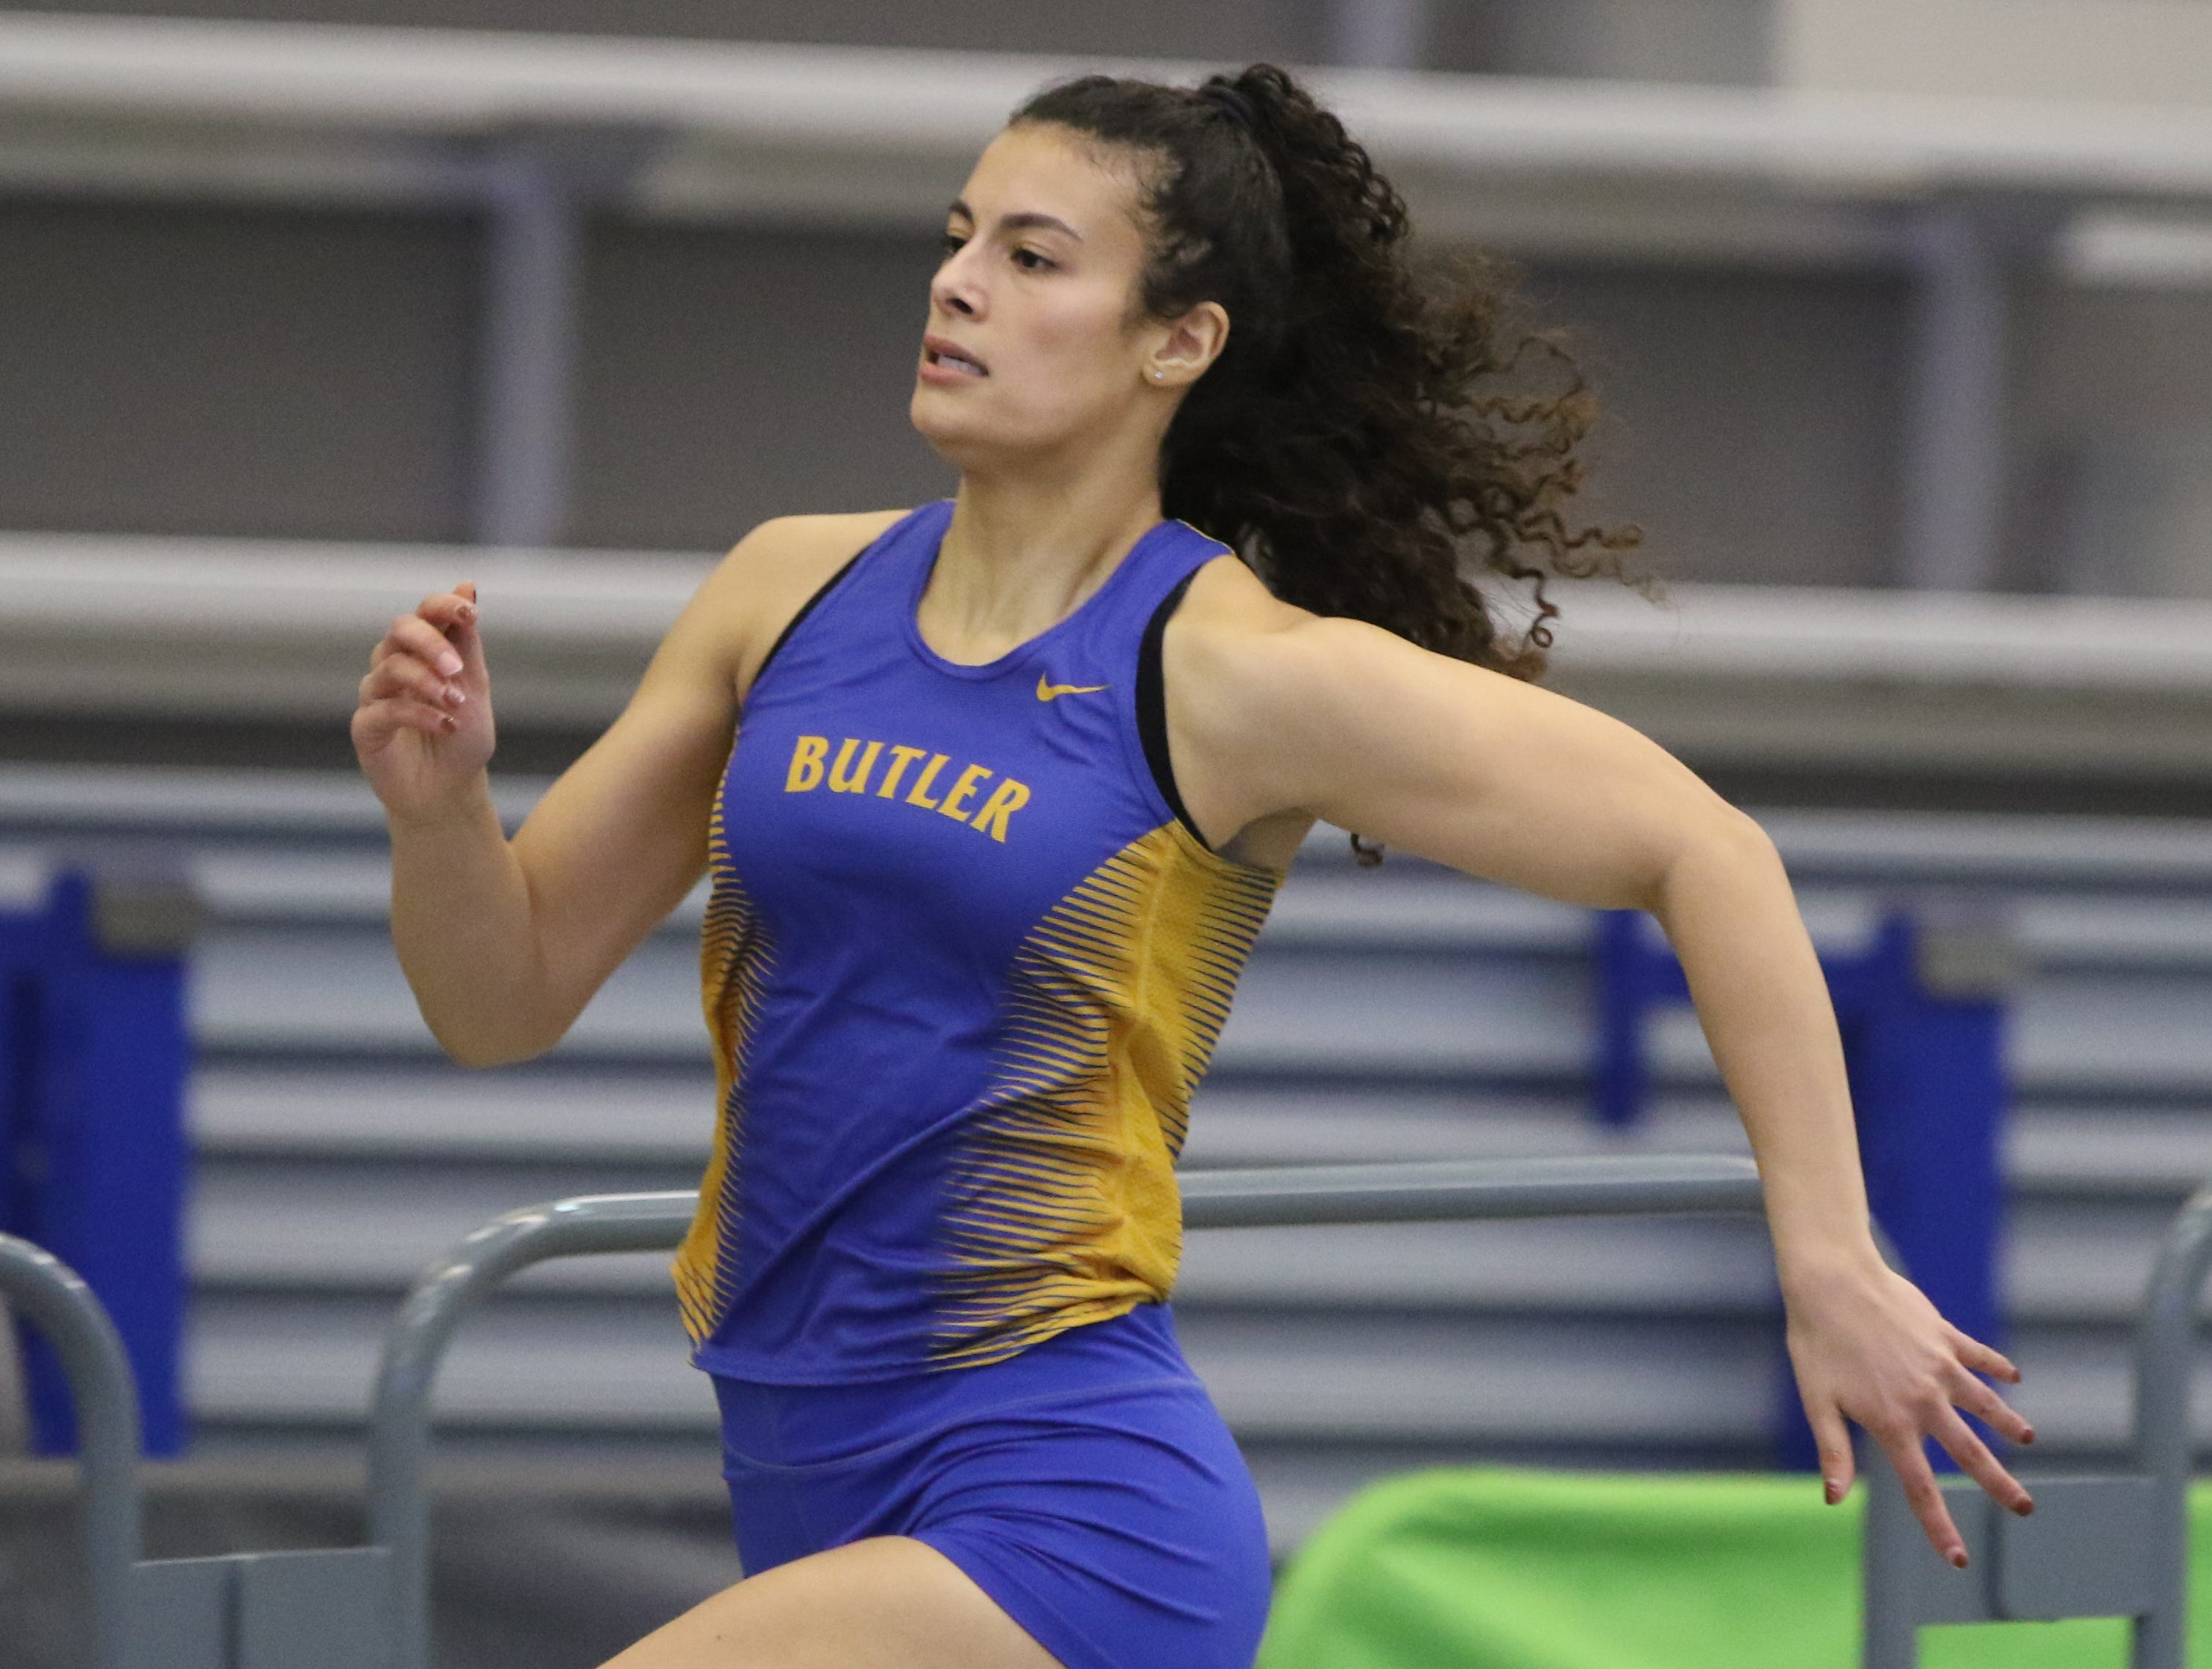 Rebecca Kneppel of Butler in the girls 300 meter run.